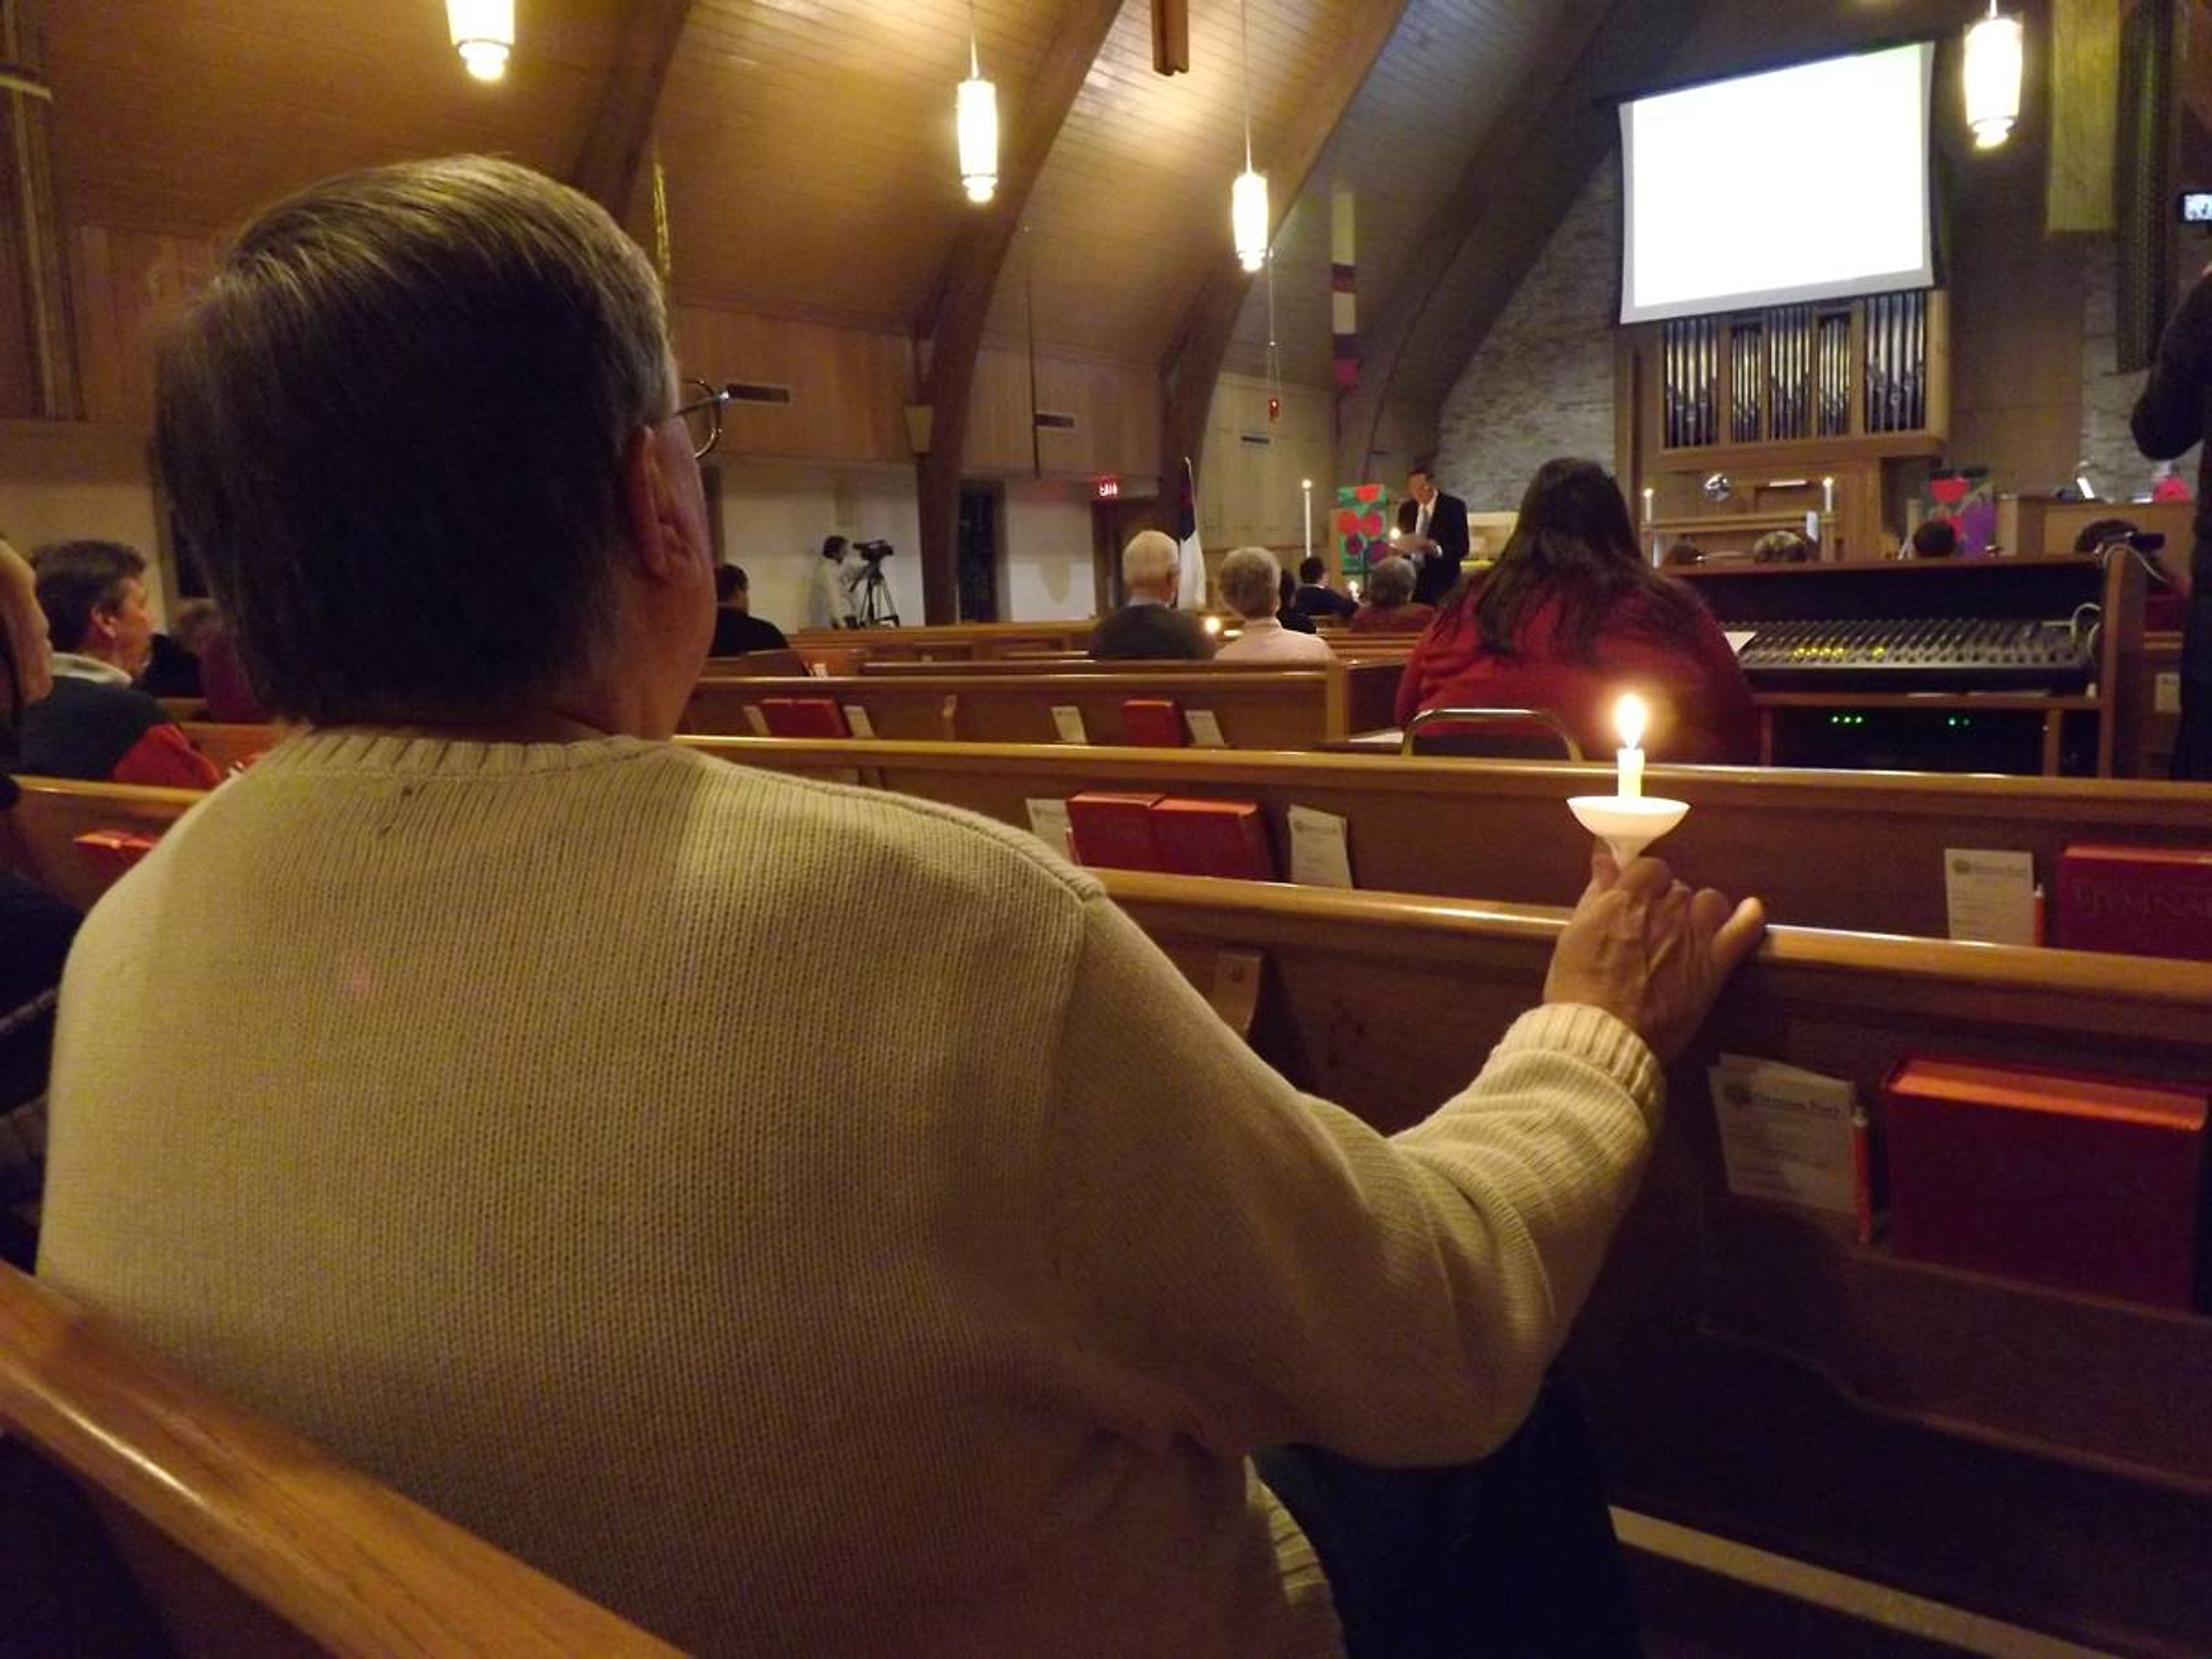 People gather to pray for Dr. Martin Salia at Hanscom Park United Methodist Church in Omaha, Neb., Nov. 16.